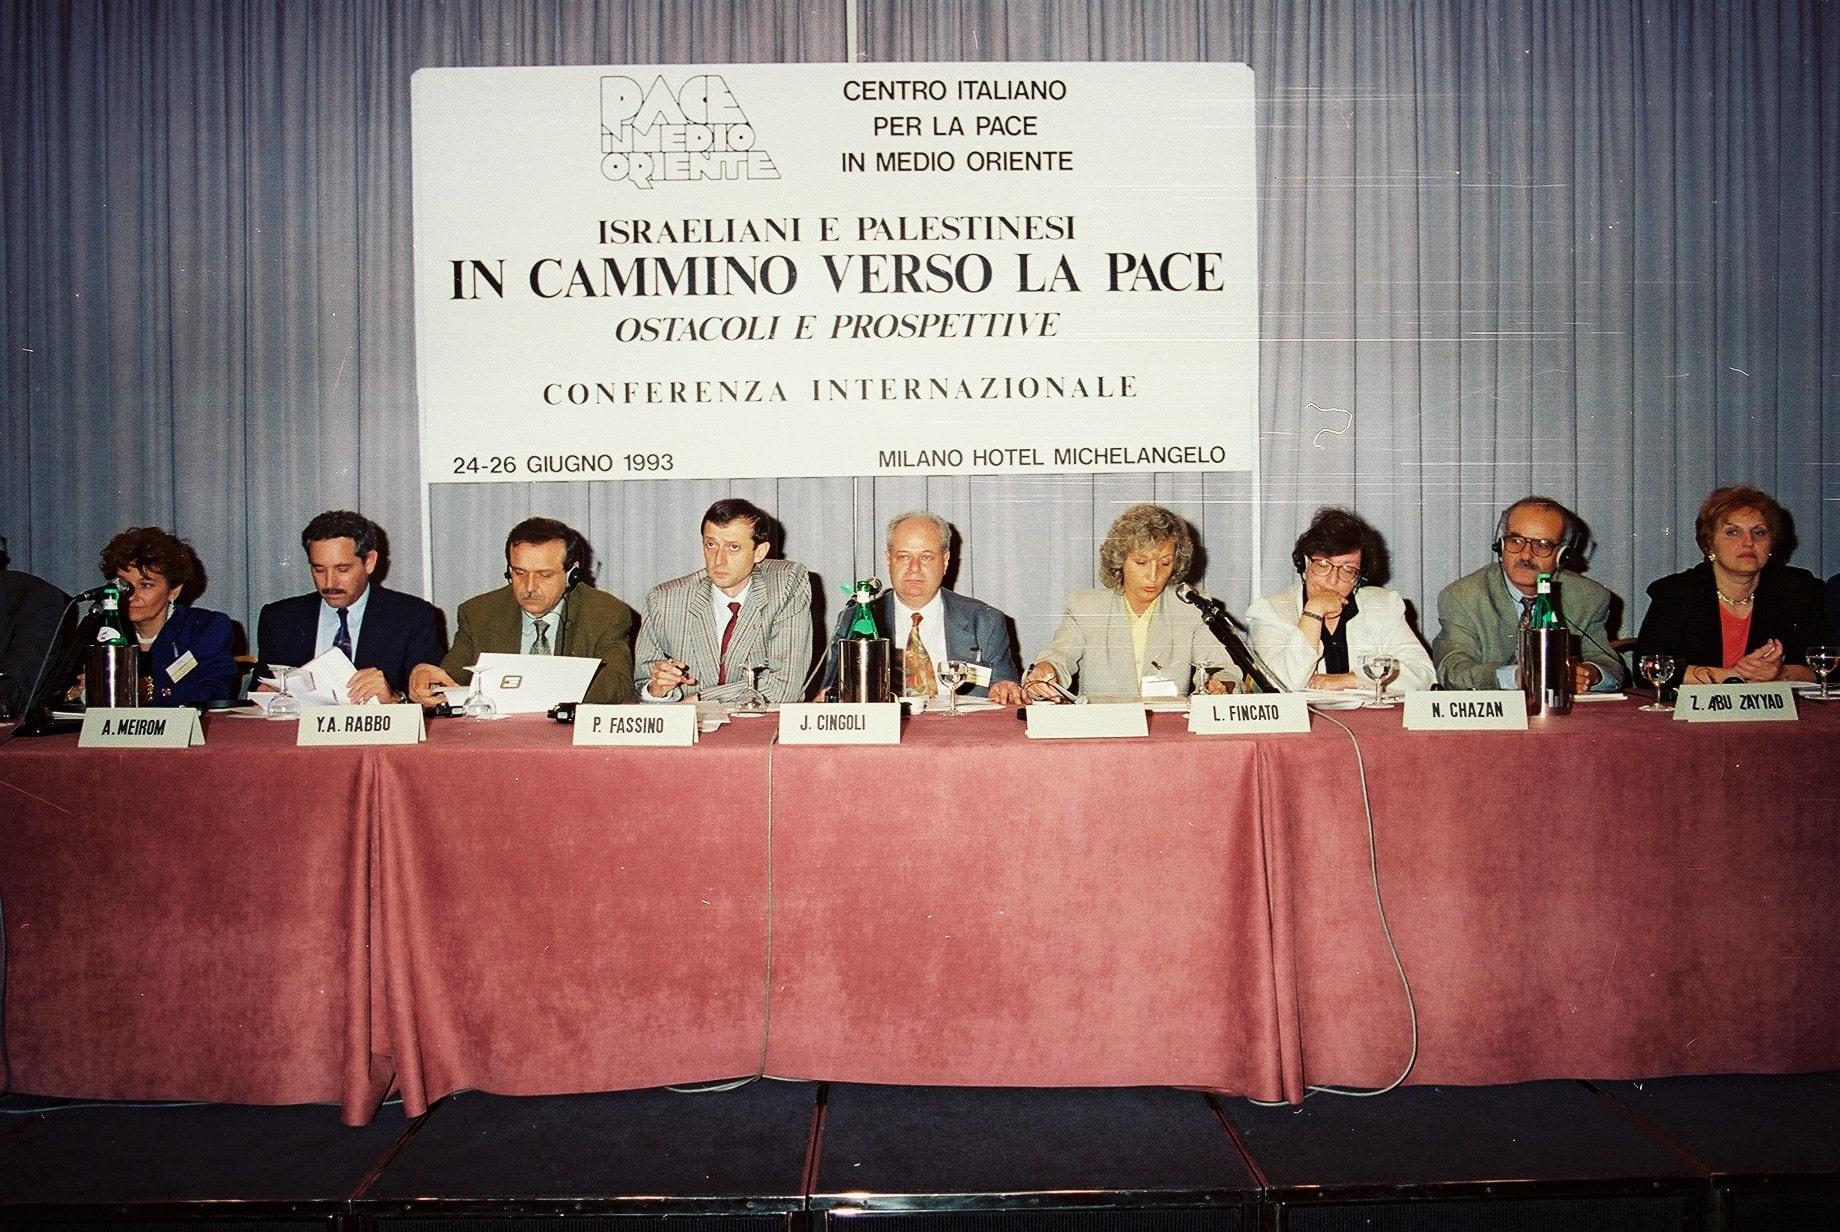 Da sinistra: Hagai Meron, Yasser Abed Rabbo, Piero Fassino, Janiki Cingoli, Naomi Hazan, Ziad Abu Zayyad